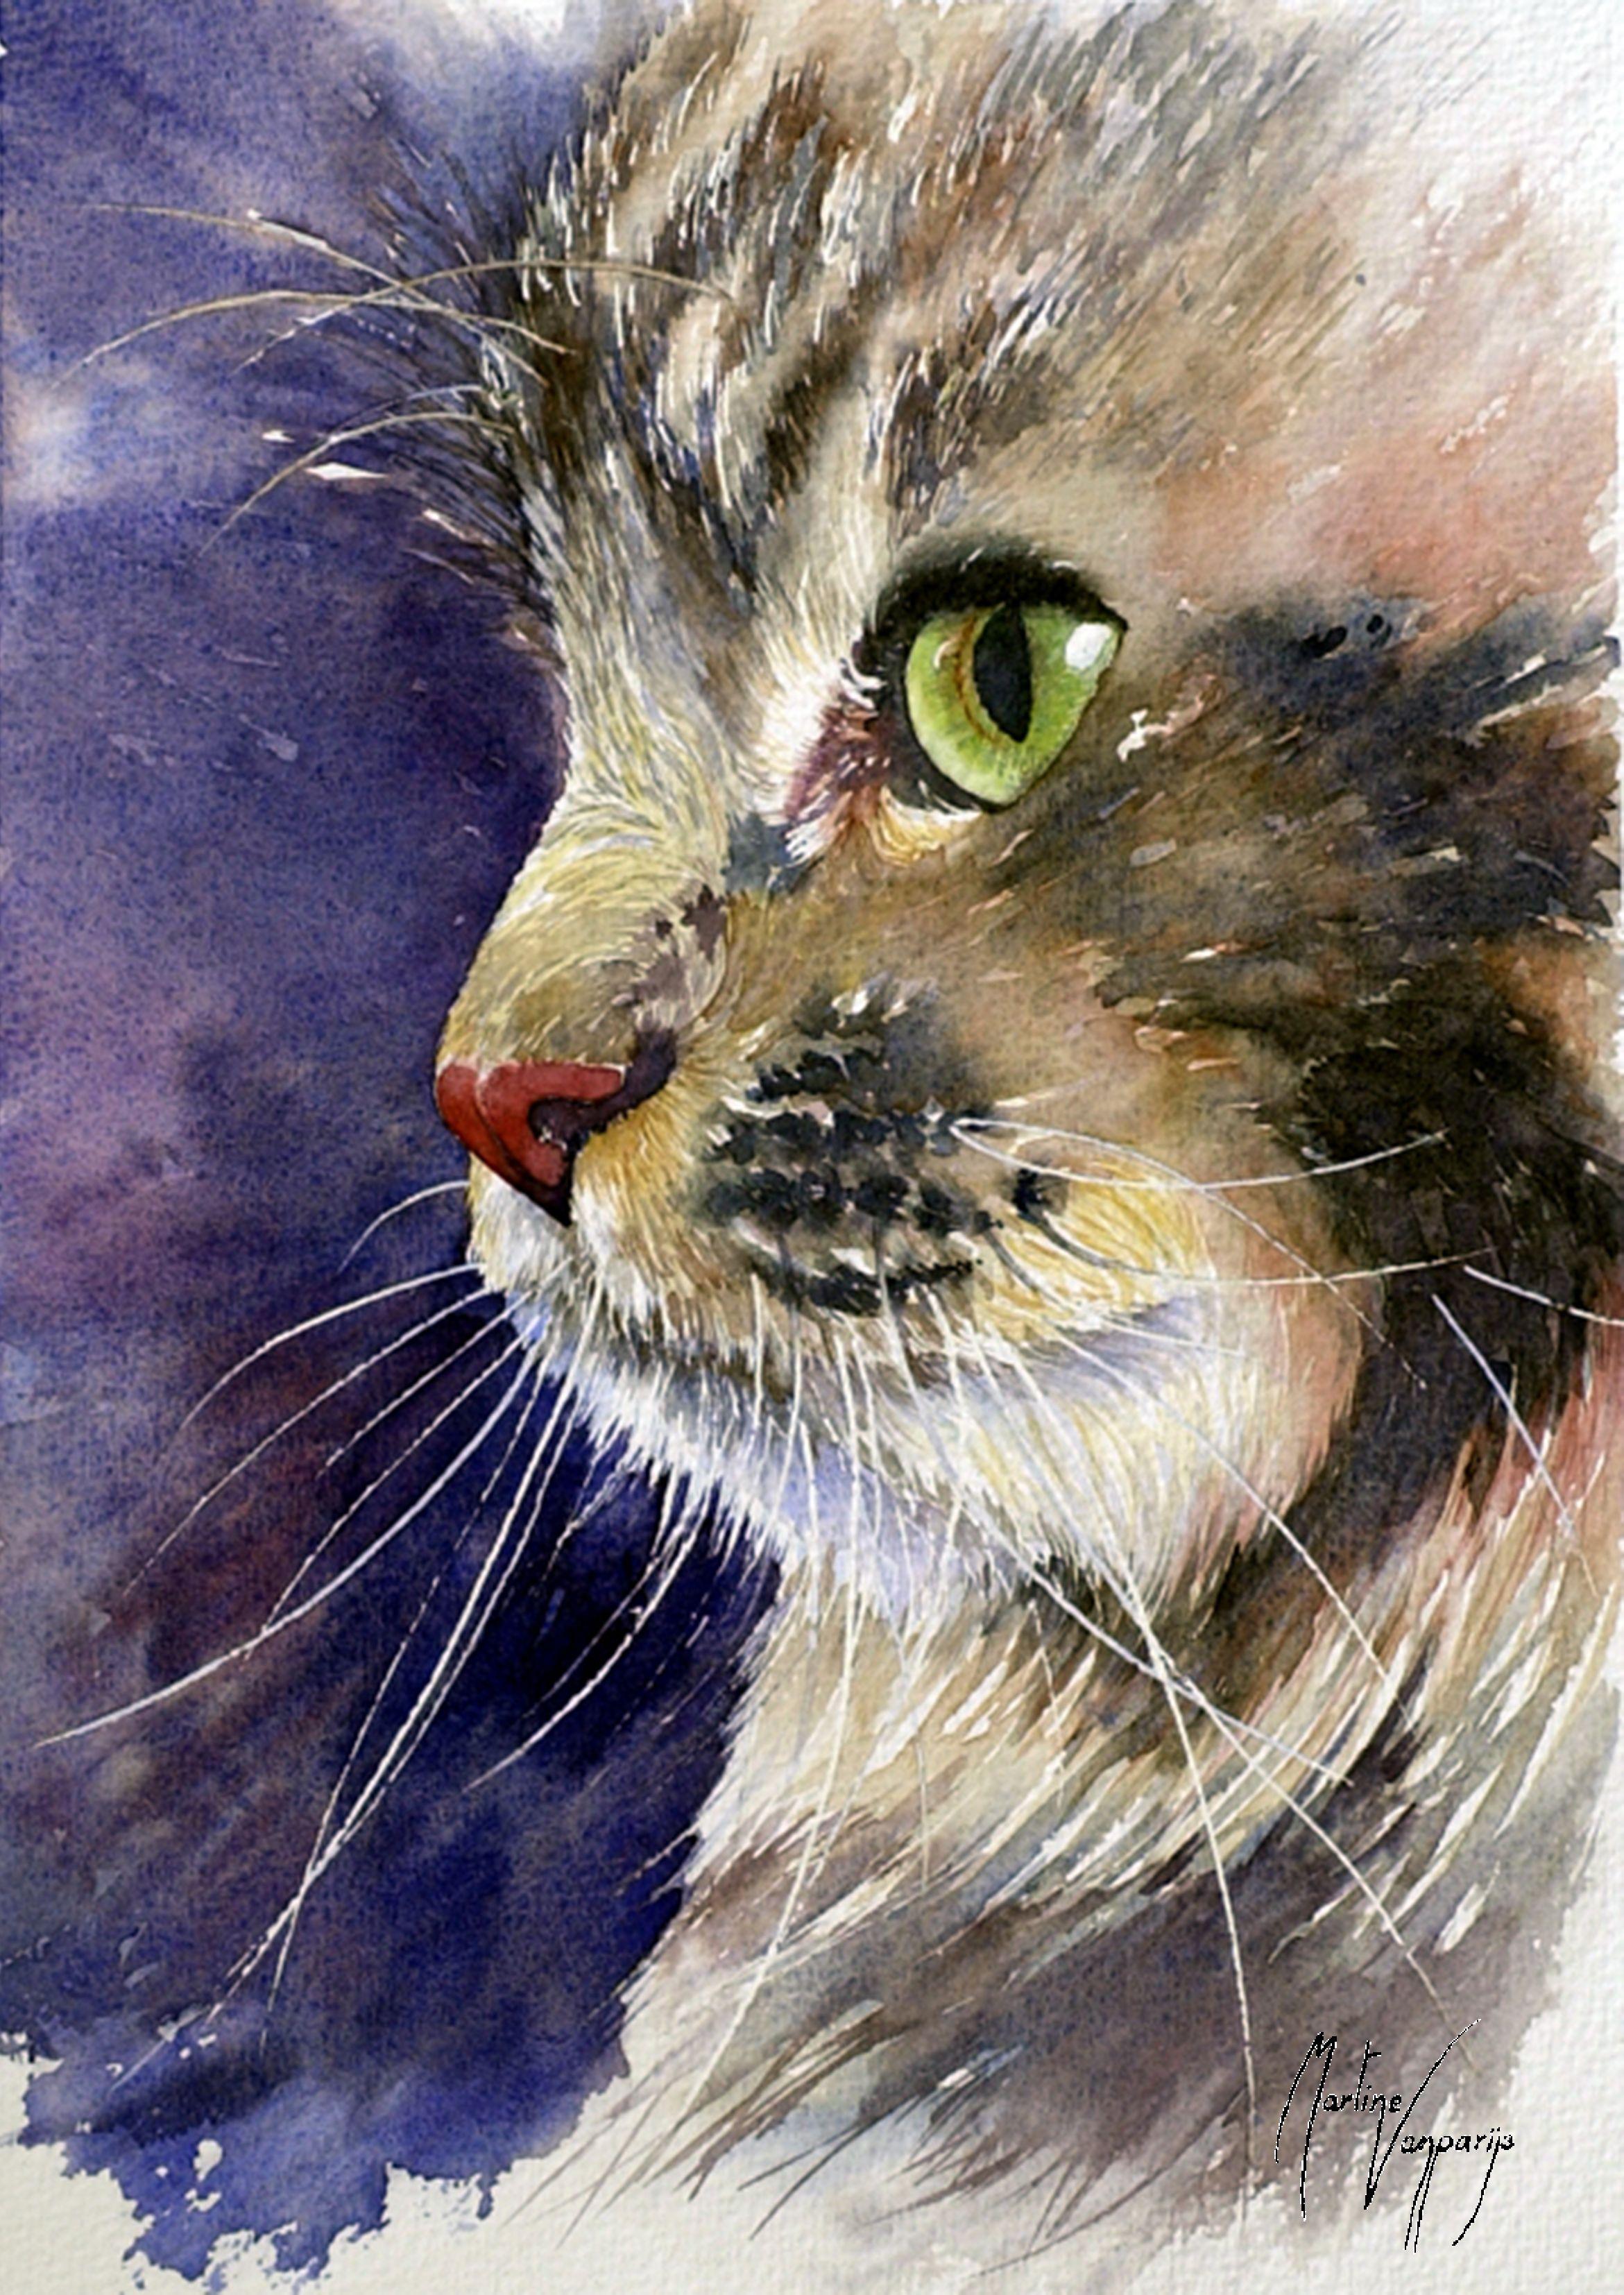 Katze Tiere Malen Illustration Katze Katze Malen